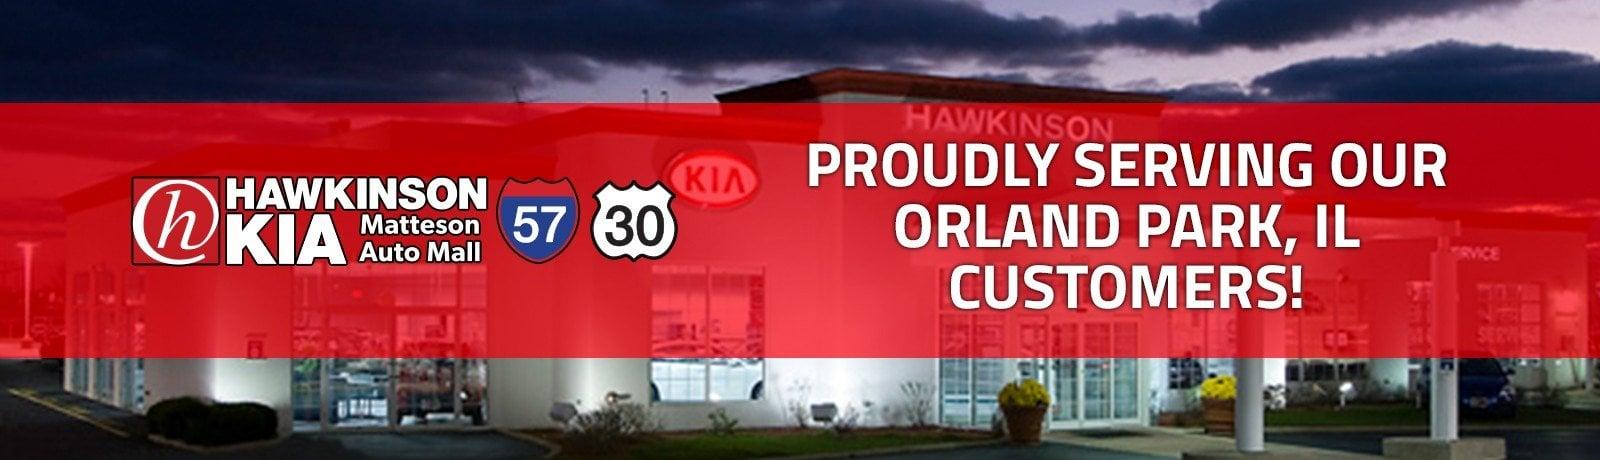 Hawkinson KIA Orland Park